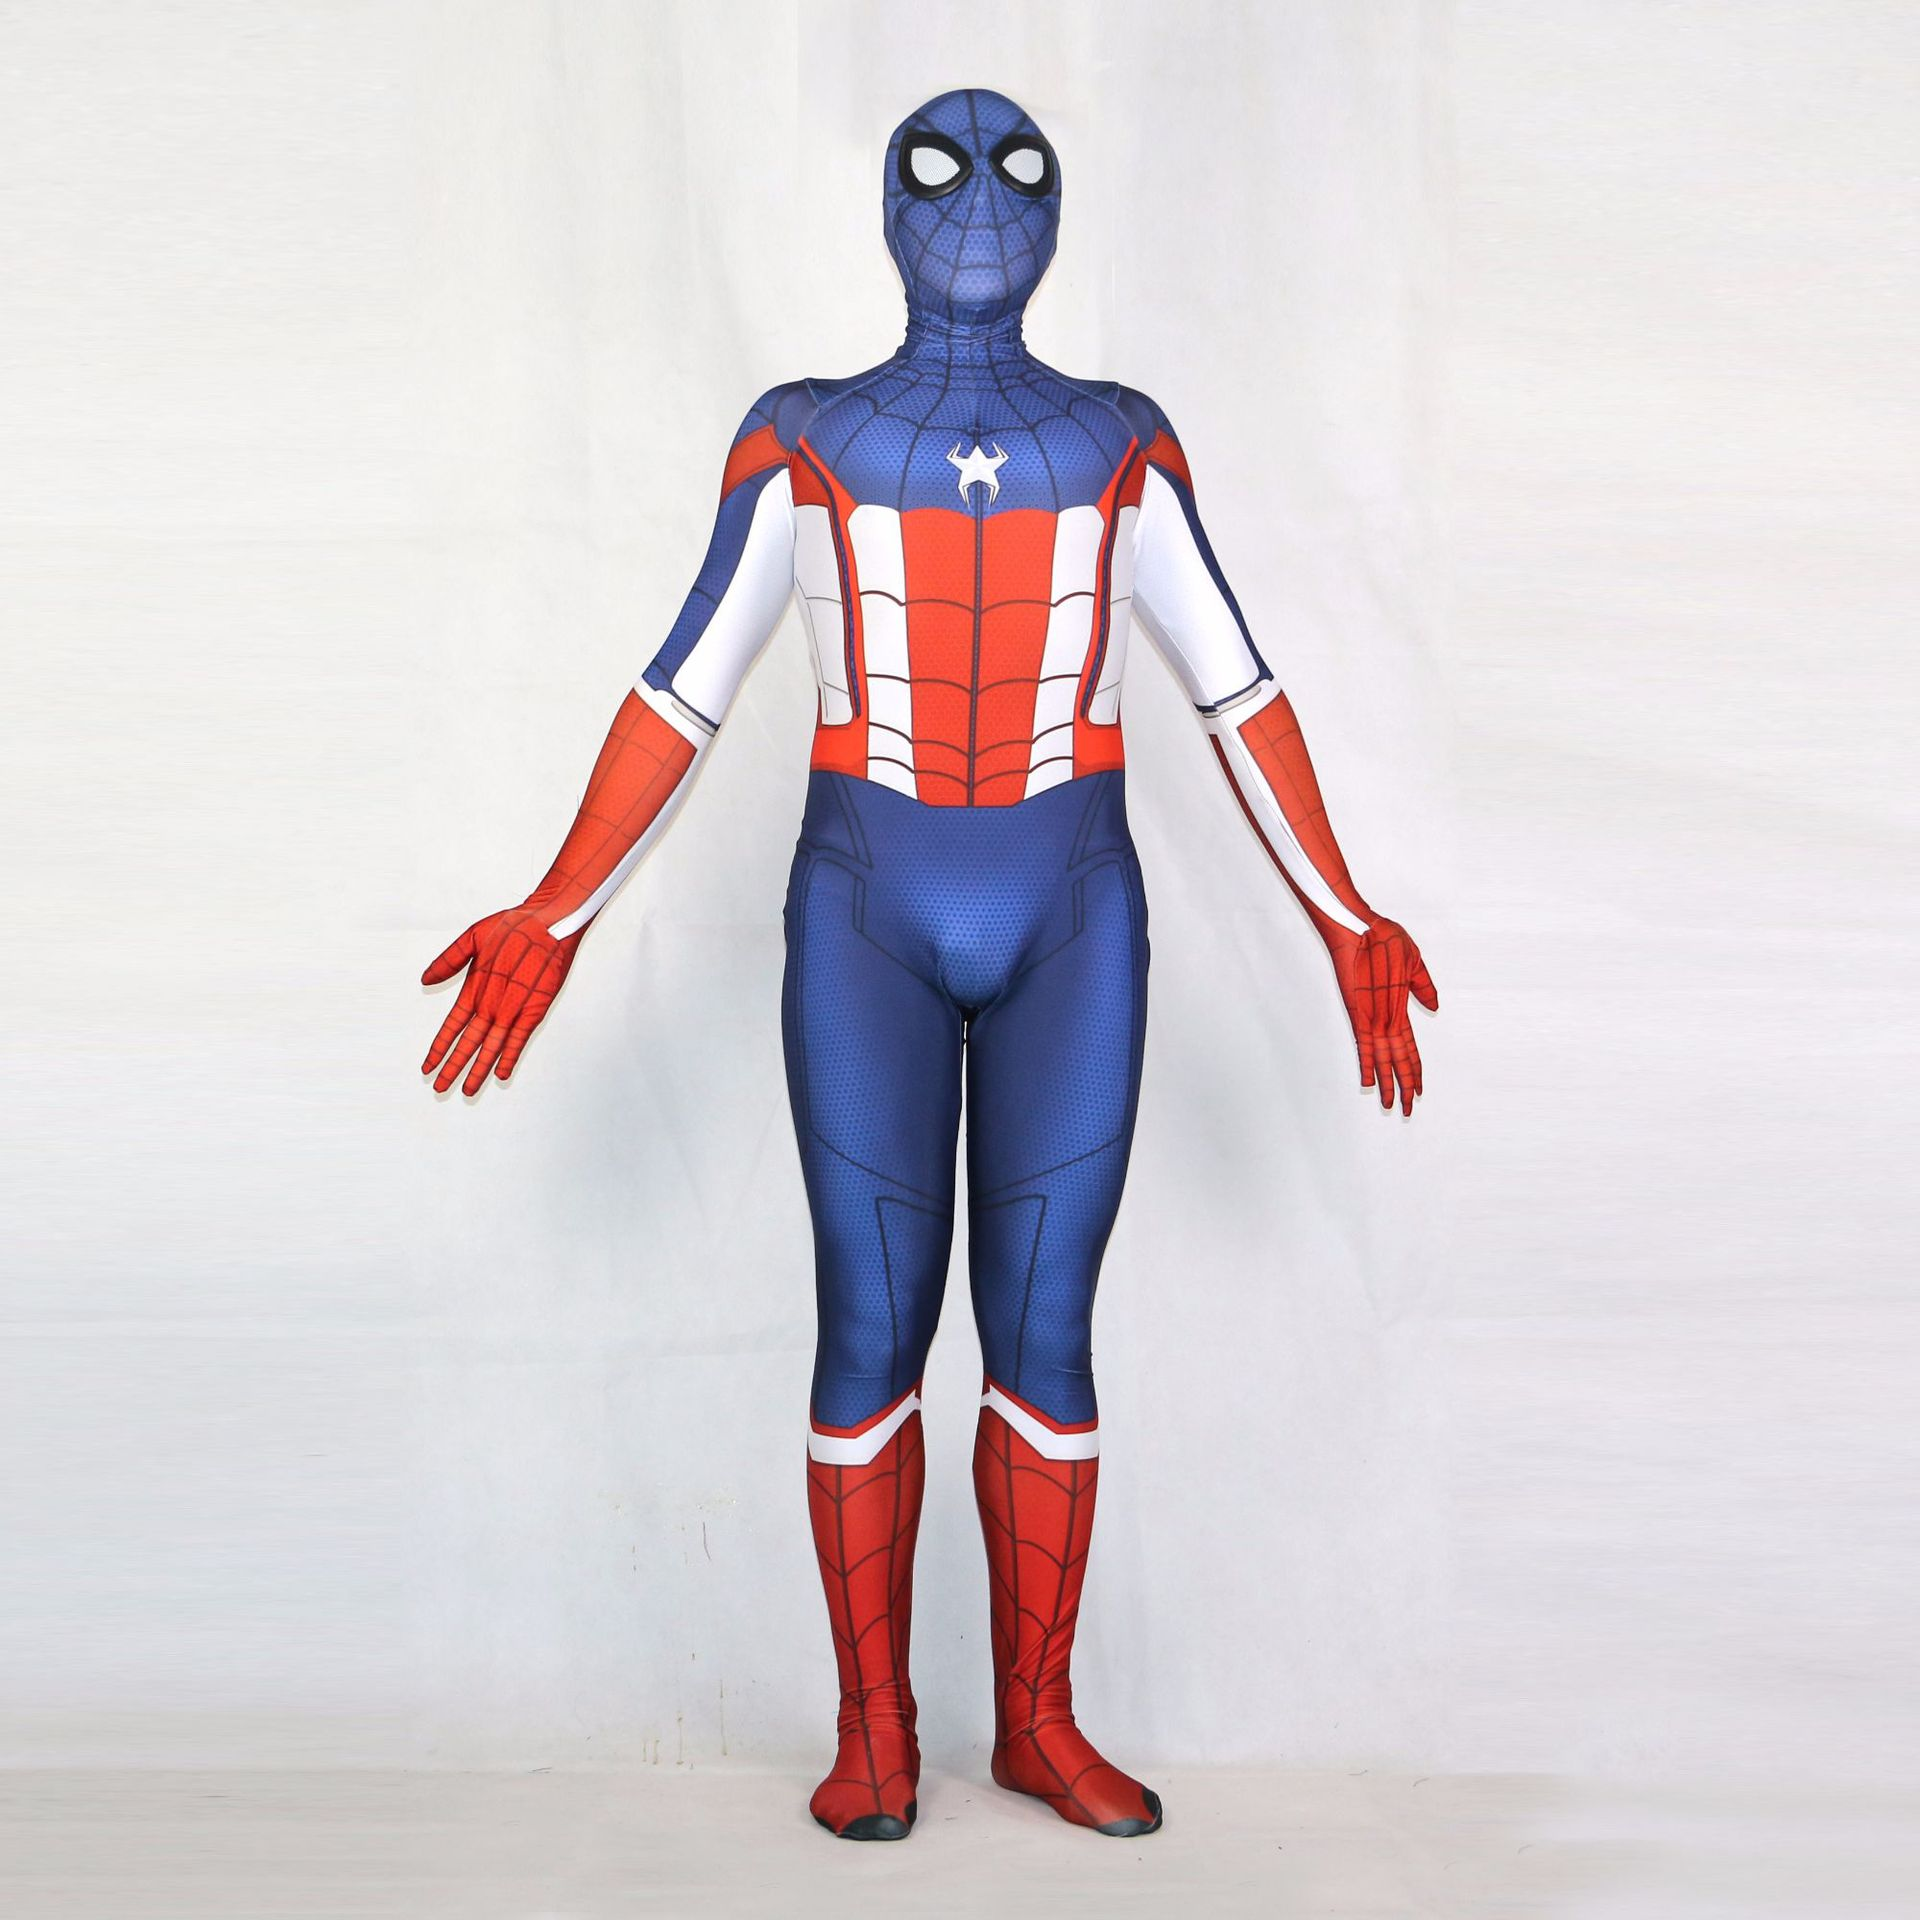 Spiderman Tights Cosplay Costume Zentai Captain America Spider Man Superhero Bodysuit Suit Jumpsuits Halloween Party Porp